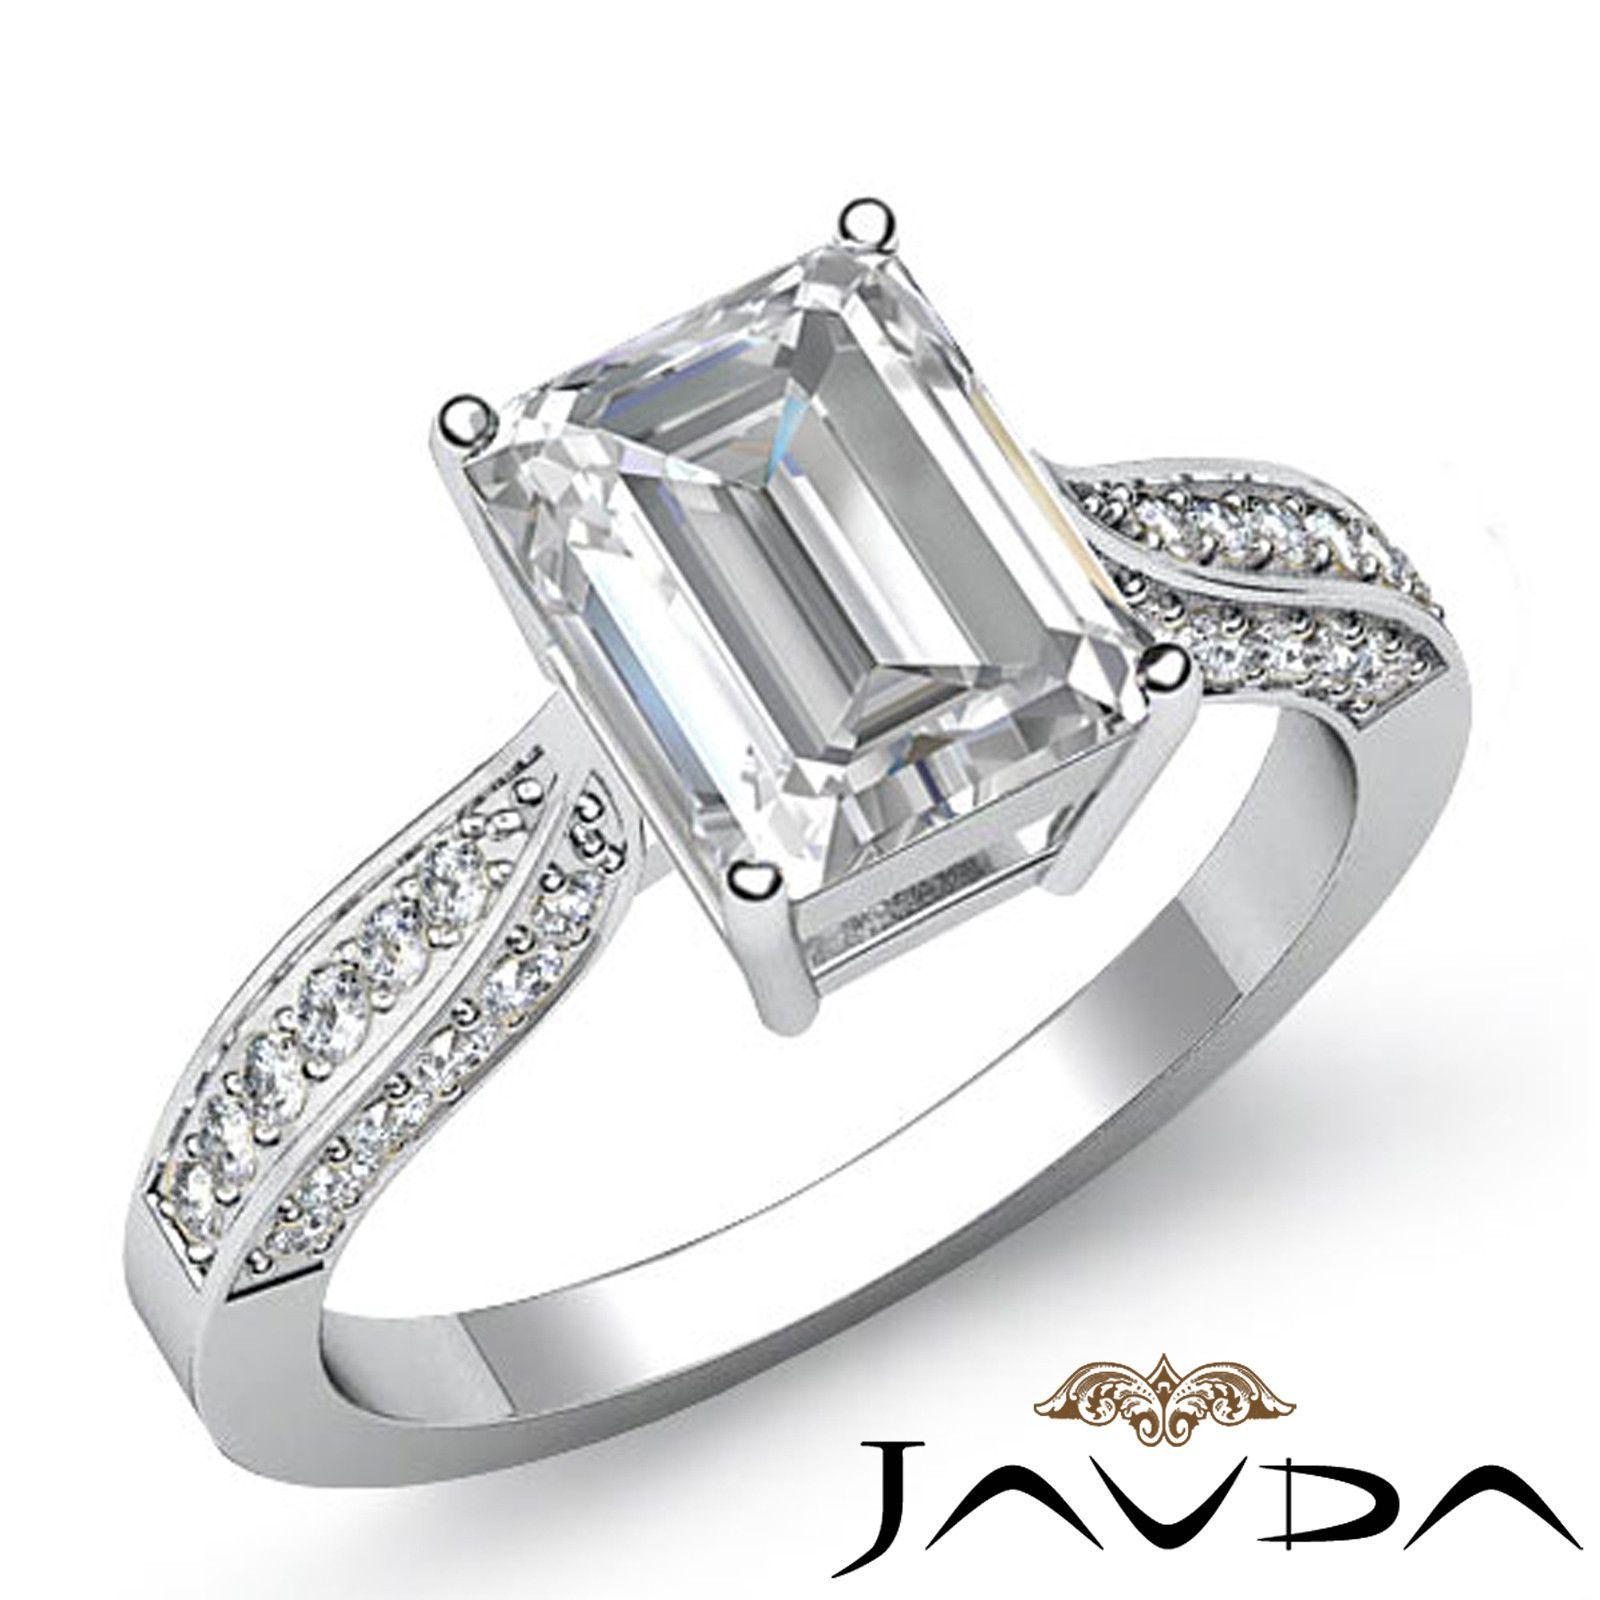 Emerald Diamond Engagement EGL E VS2 Cathedral Pave Set Ring Platinum 950 1 4 Ct | eBay